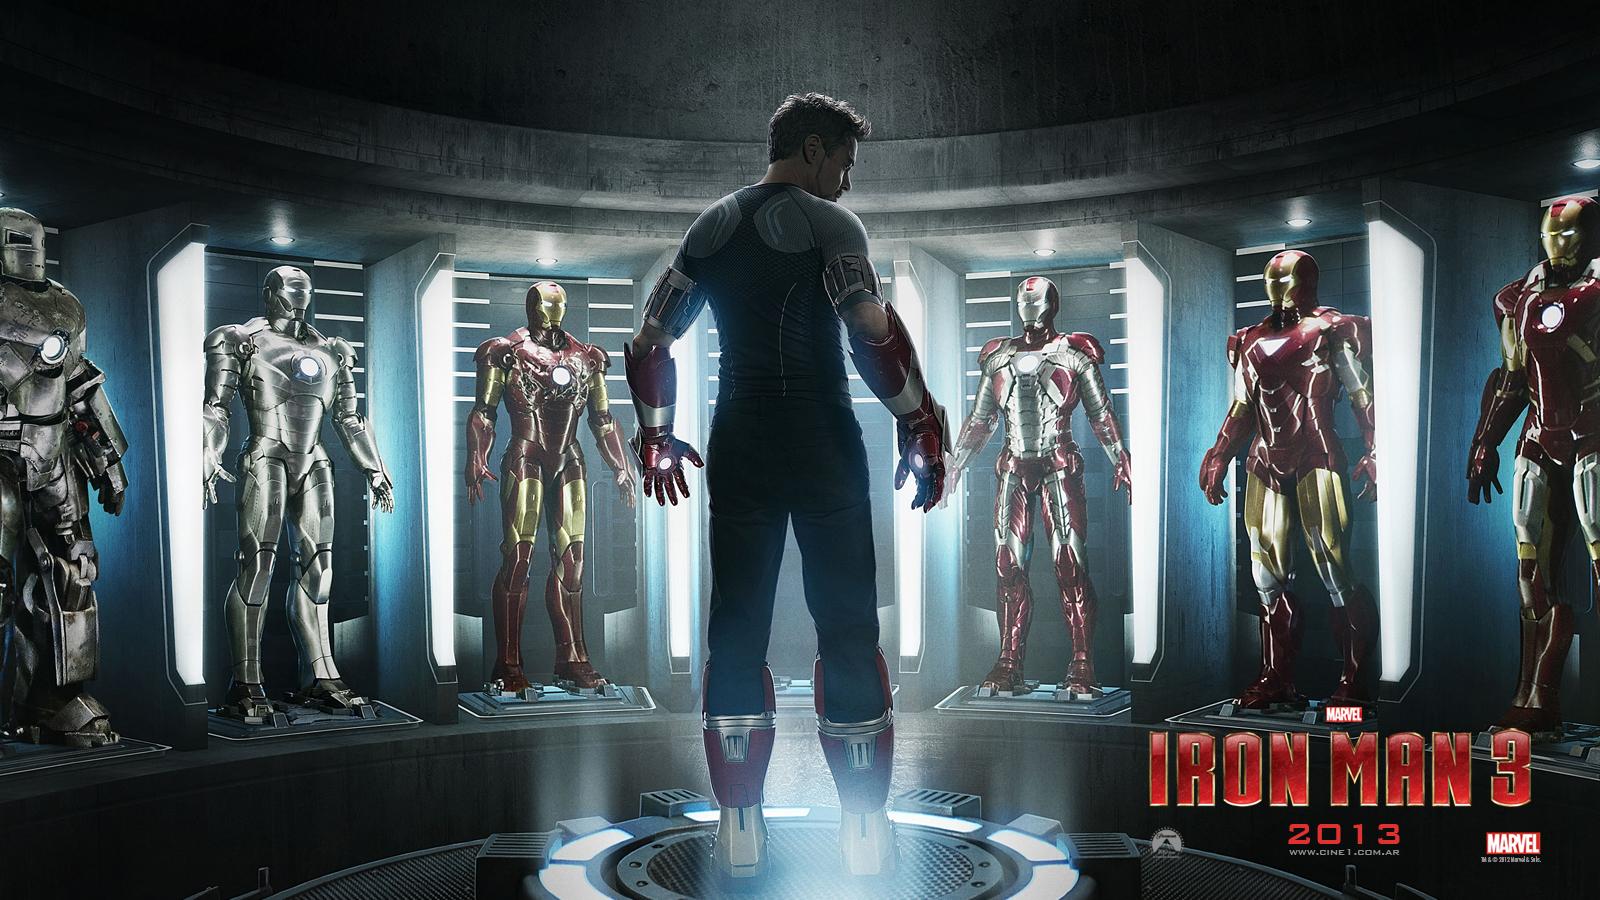 Iron Man 3 wallpaper 5